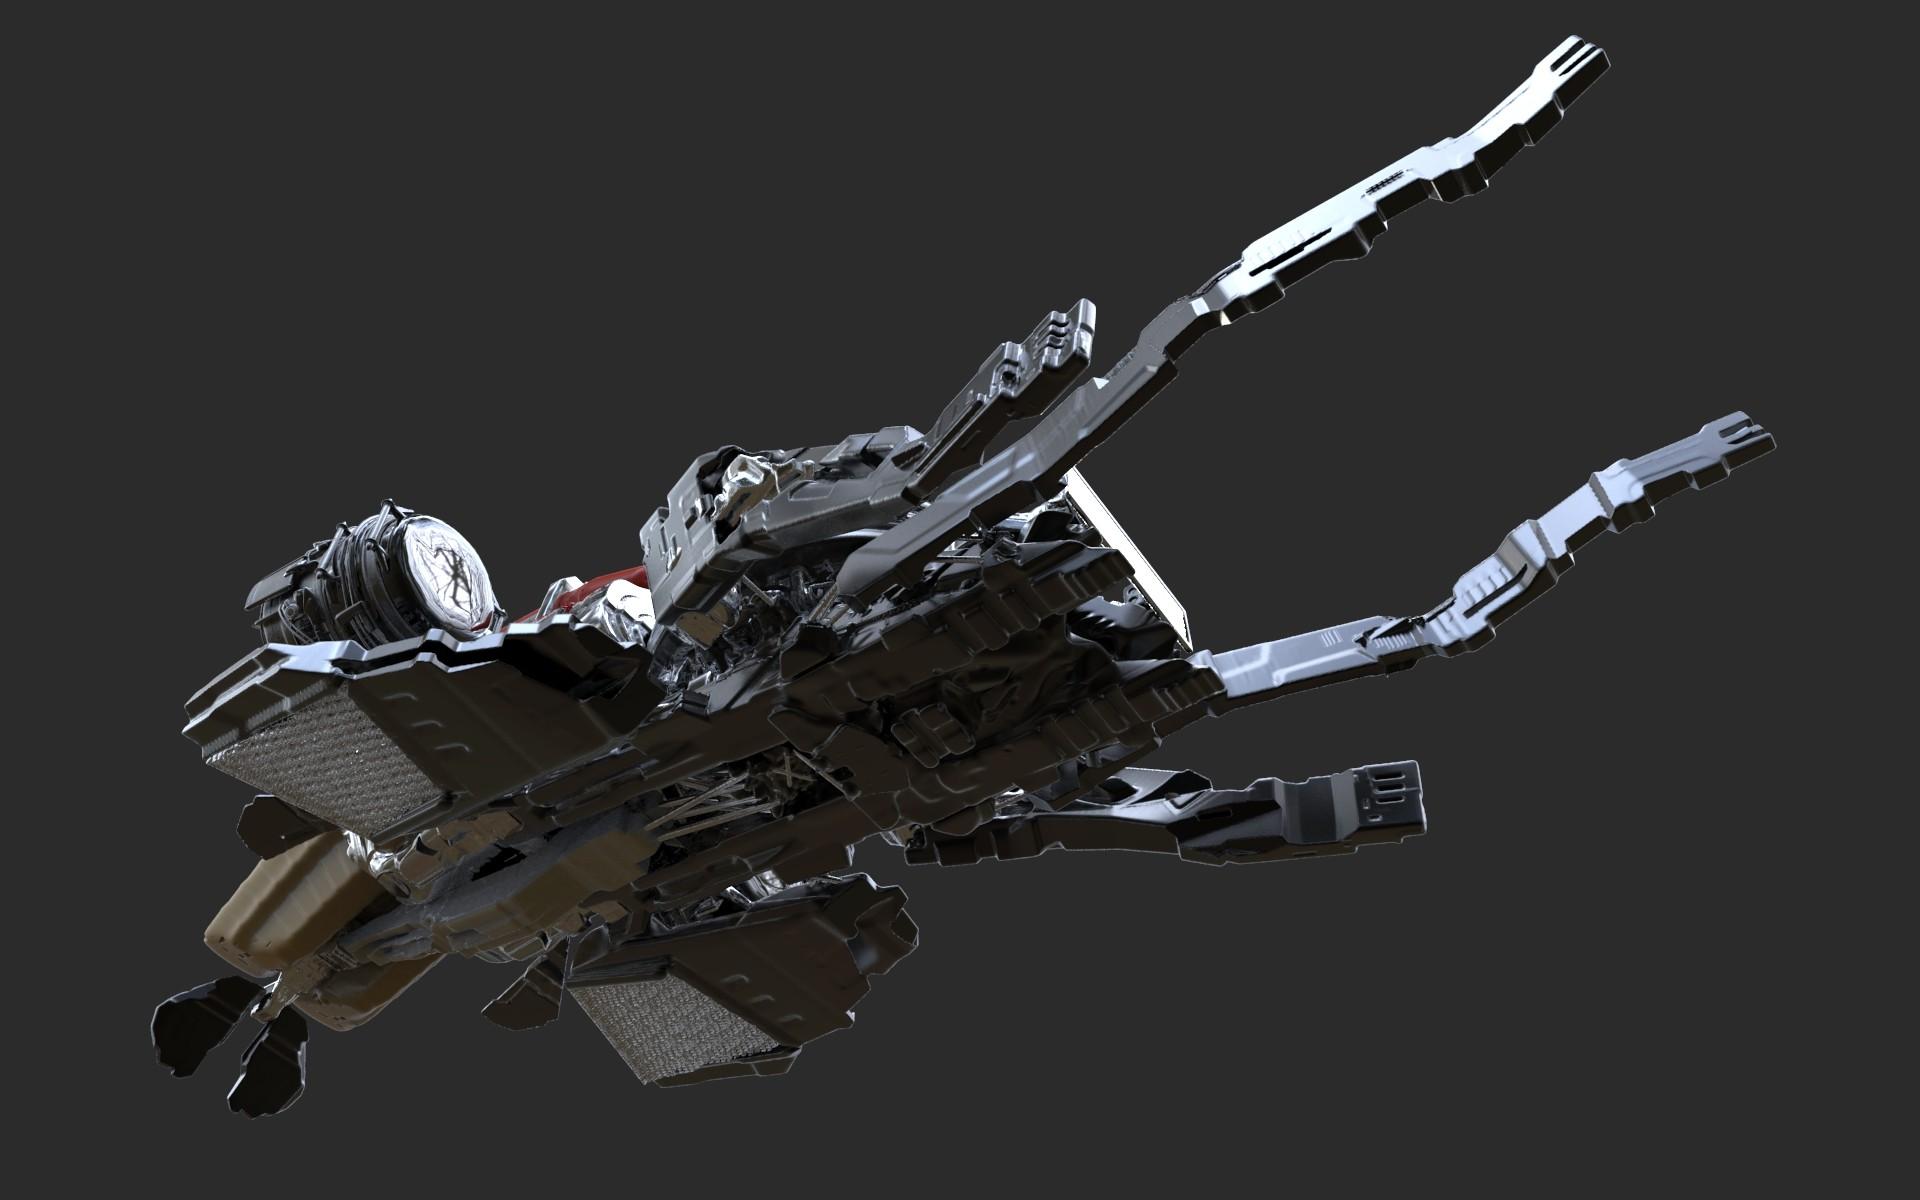 Sergio seabra shrimpfly spaceship2 46